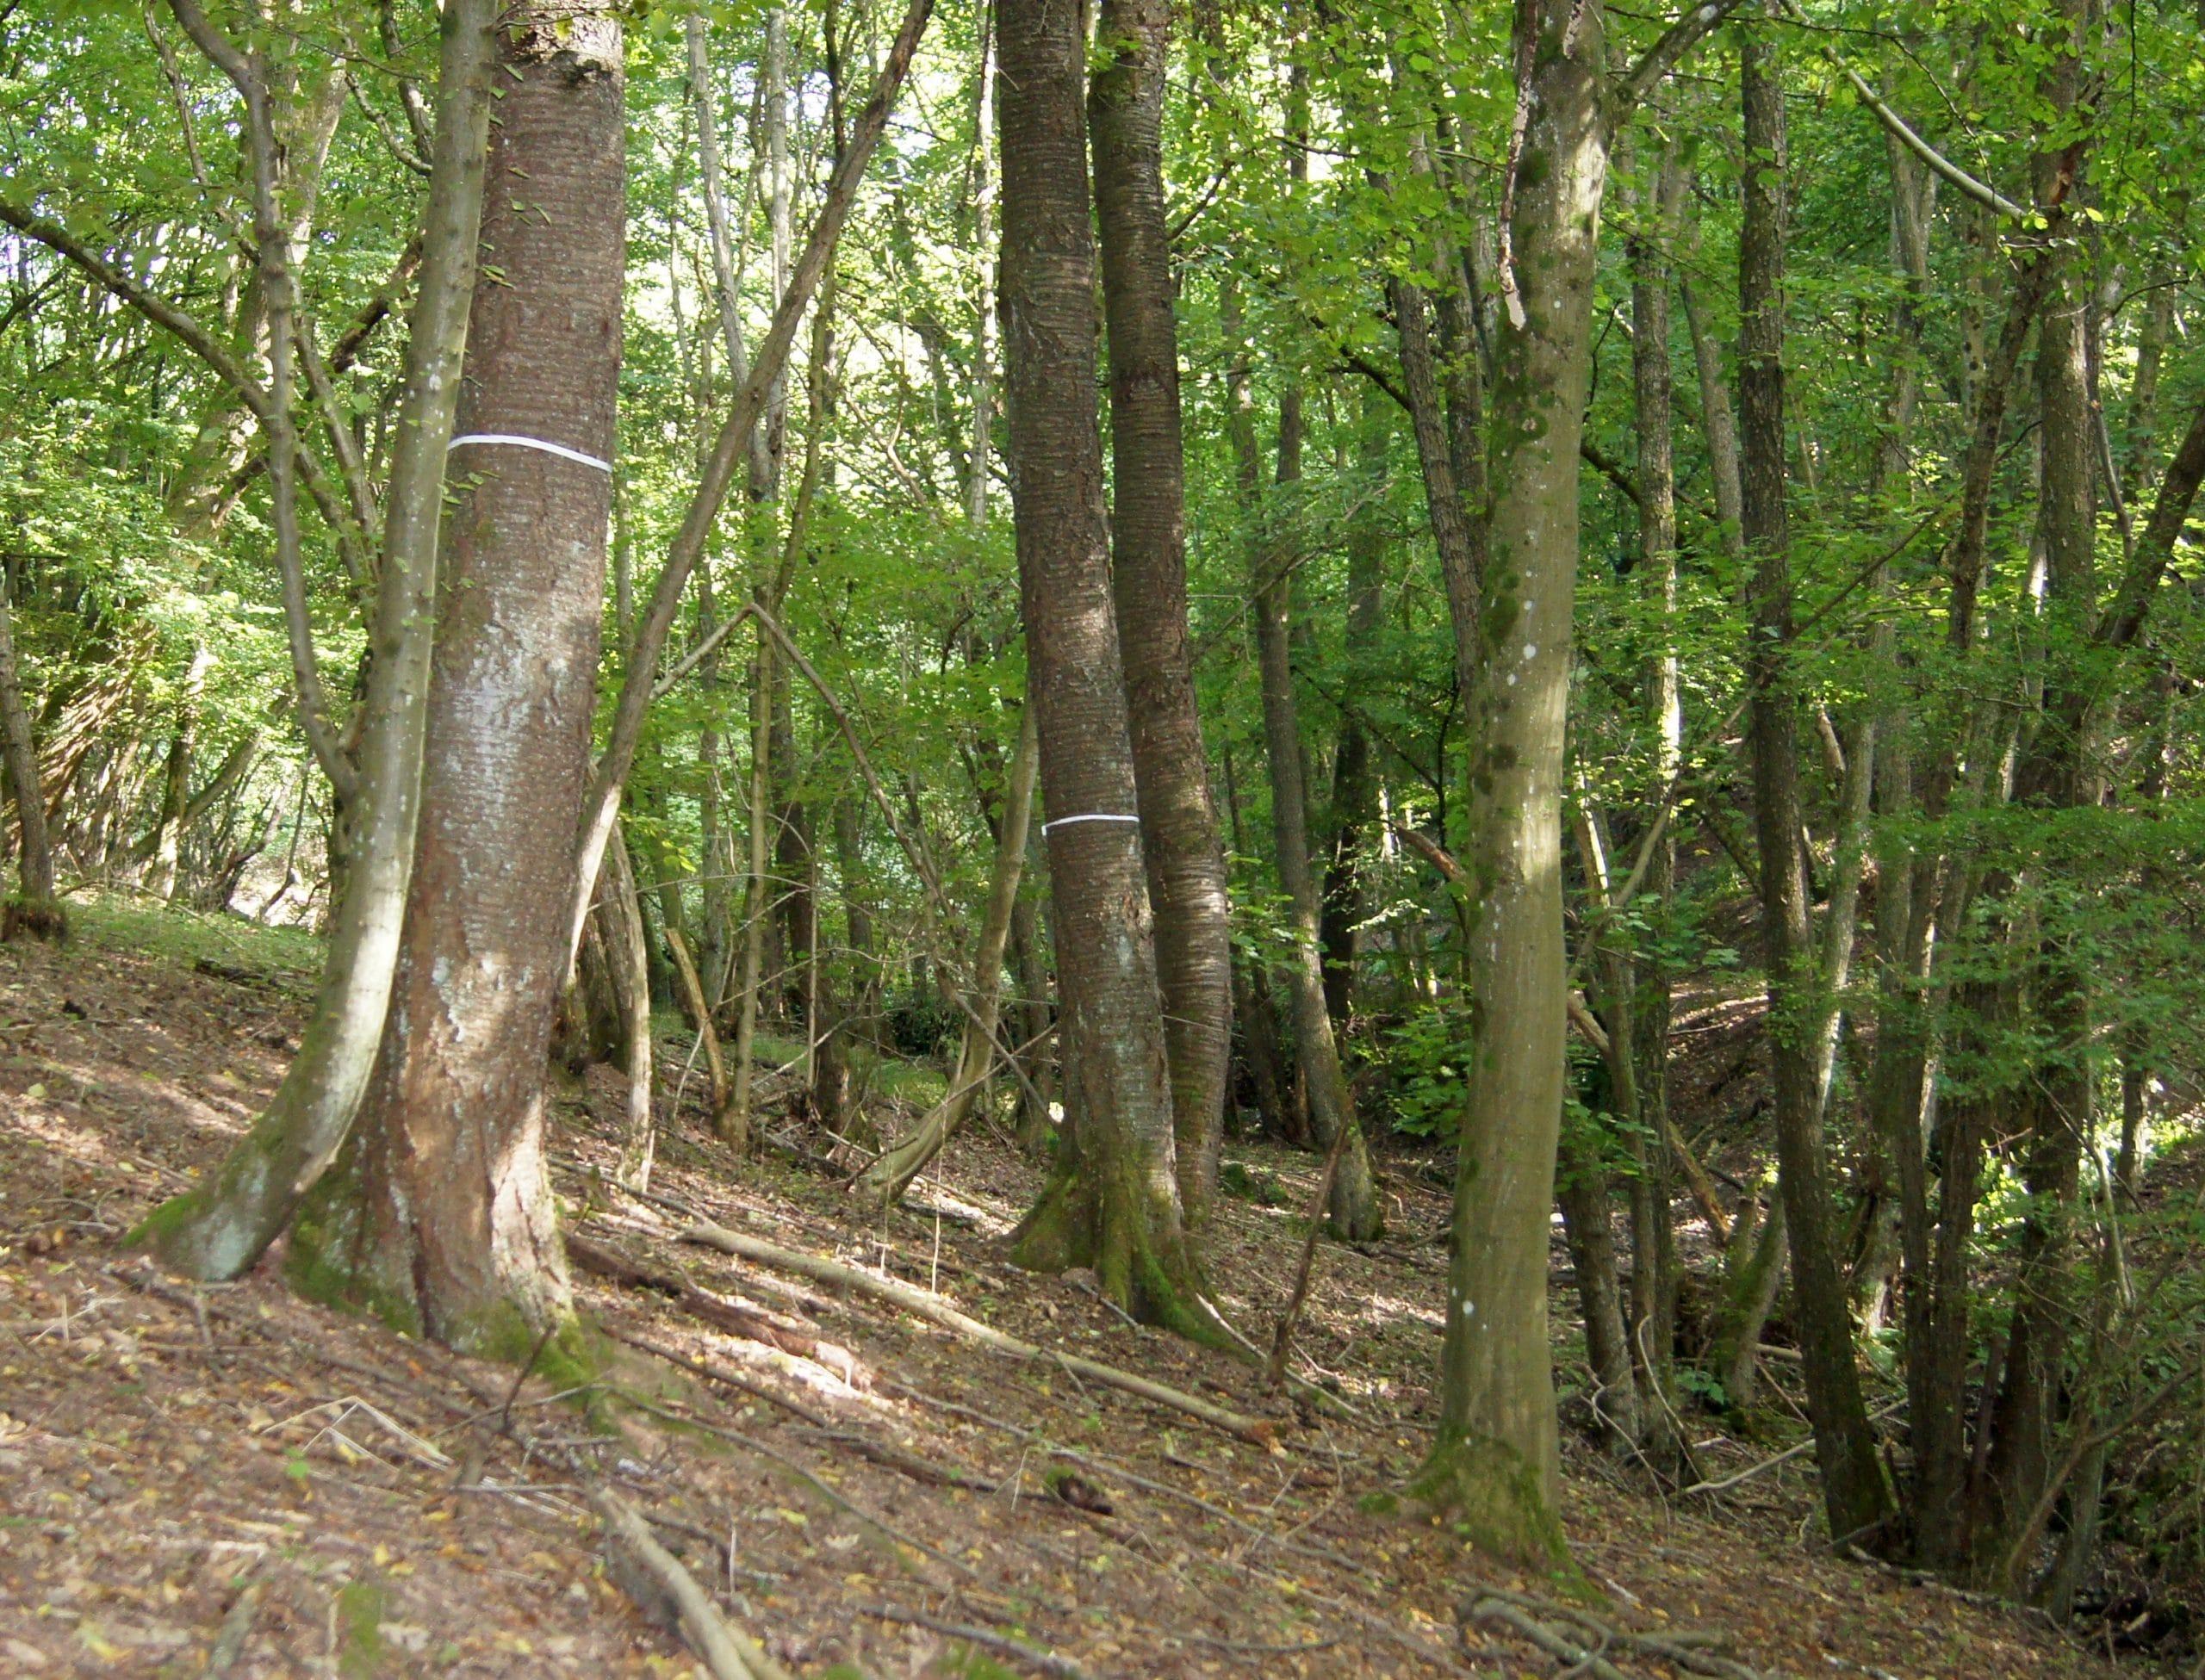 waldgrundstück mischwald nähe trier 0,85 ha | wald-prinz.de